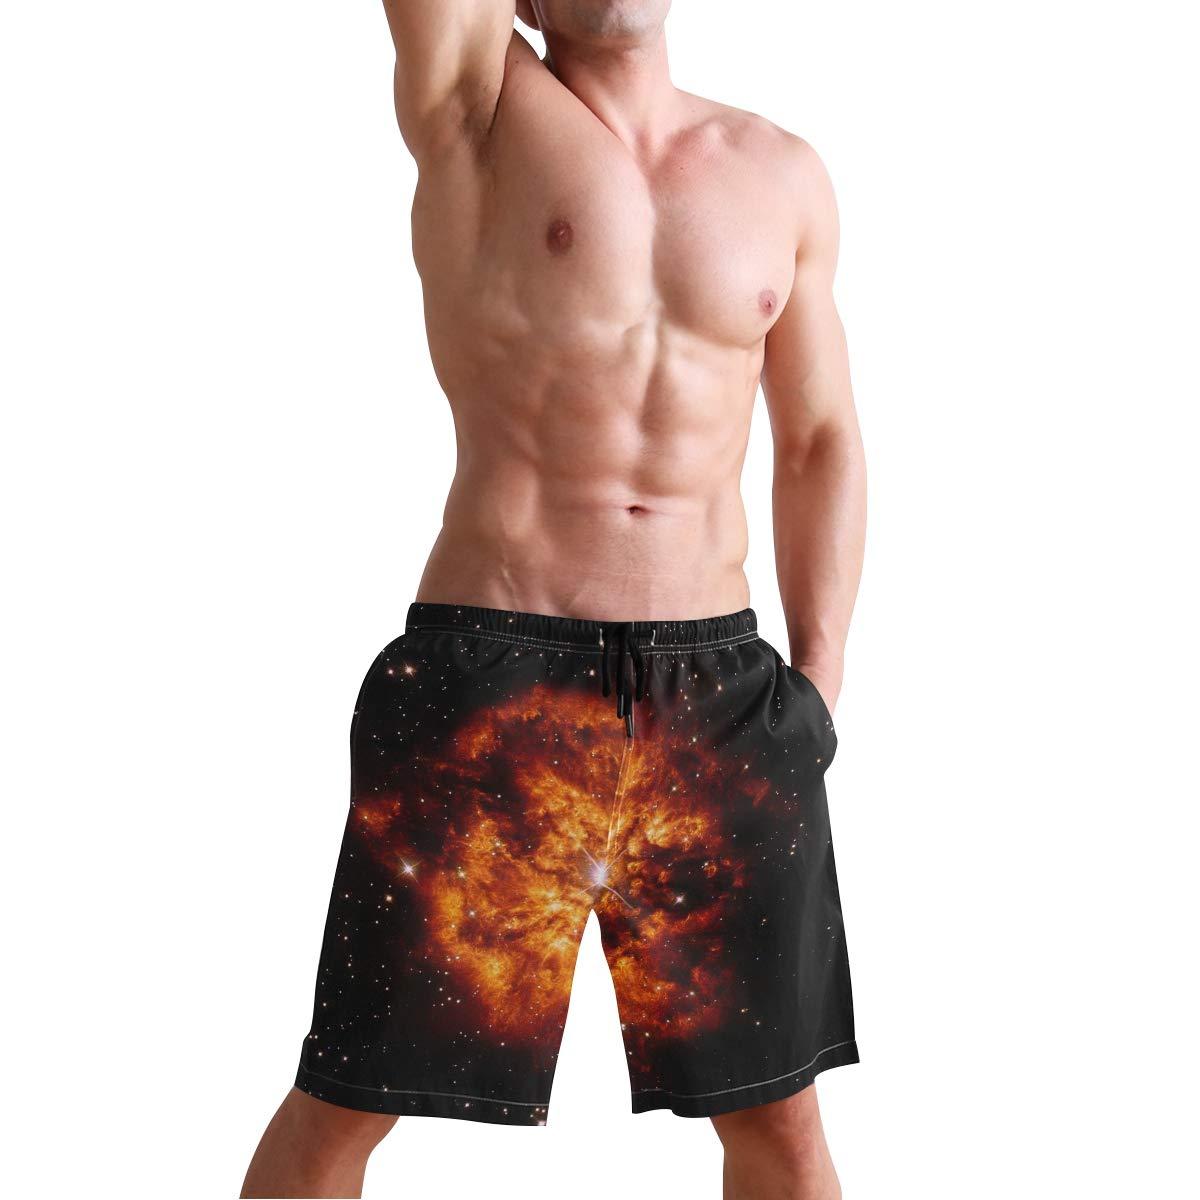 Mens Beach Swim Trunks Nebula Star Field Boxer Swimsuit Underwear Board Shorts with Pocket